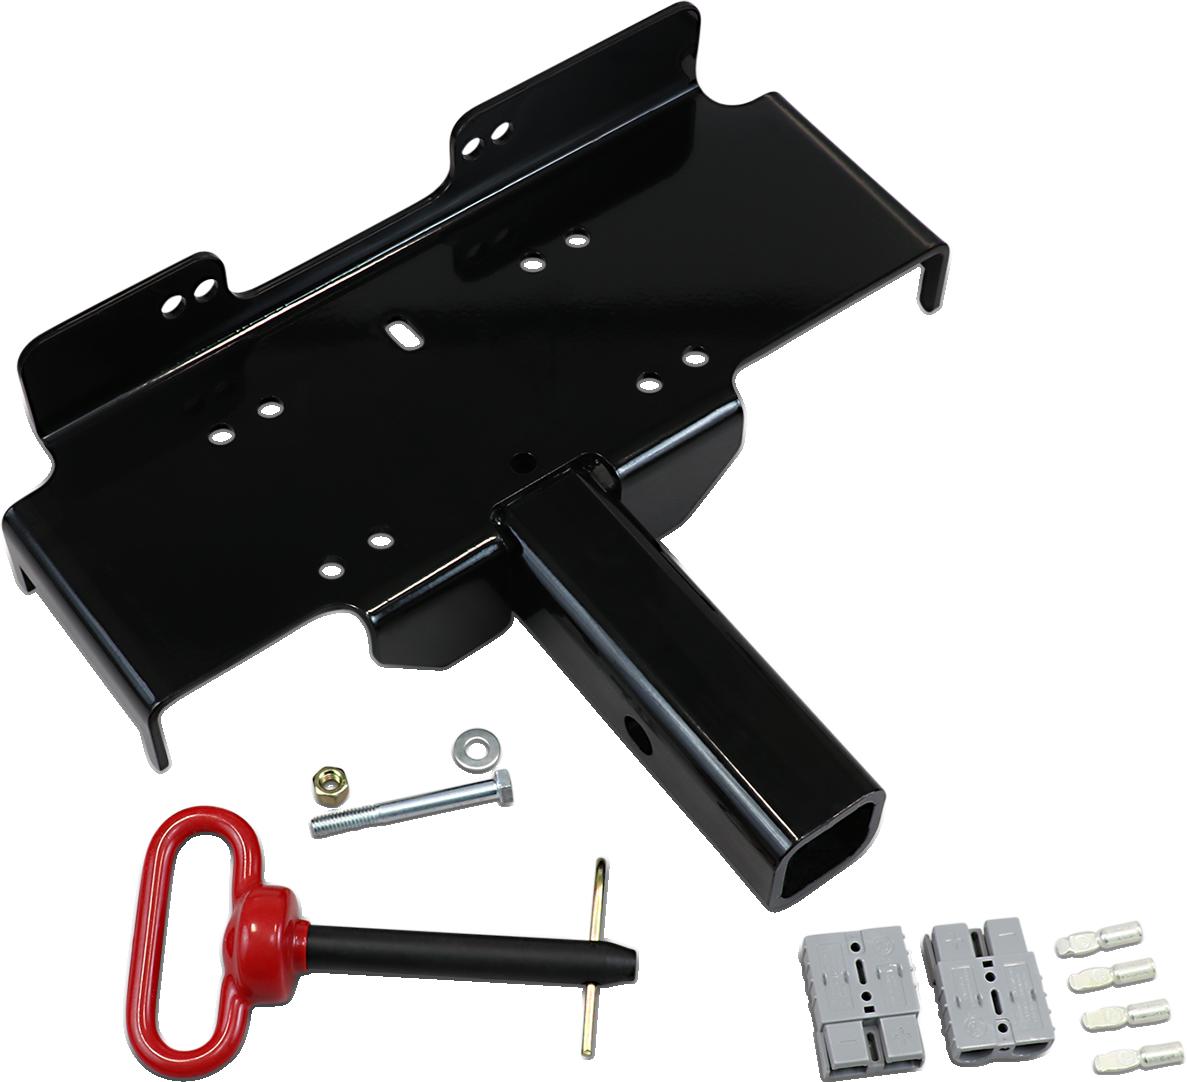 "Moose Utility Black ATV UTV Side by Side Offroad 2"" Winch Mount Receiver Kit"